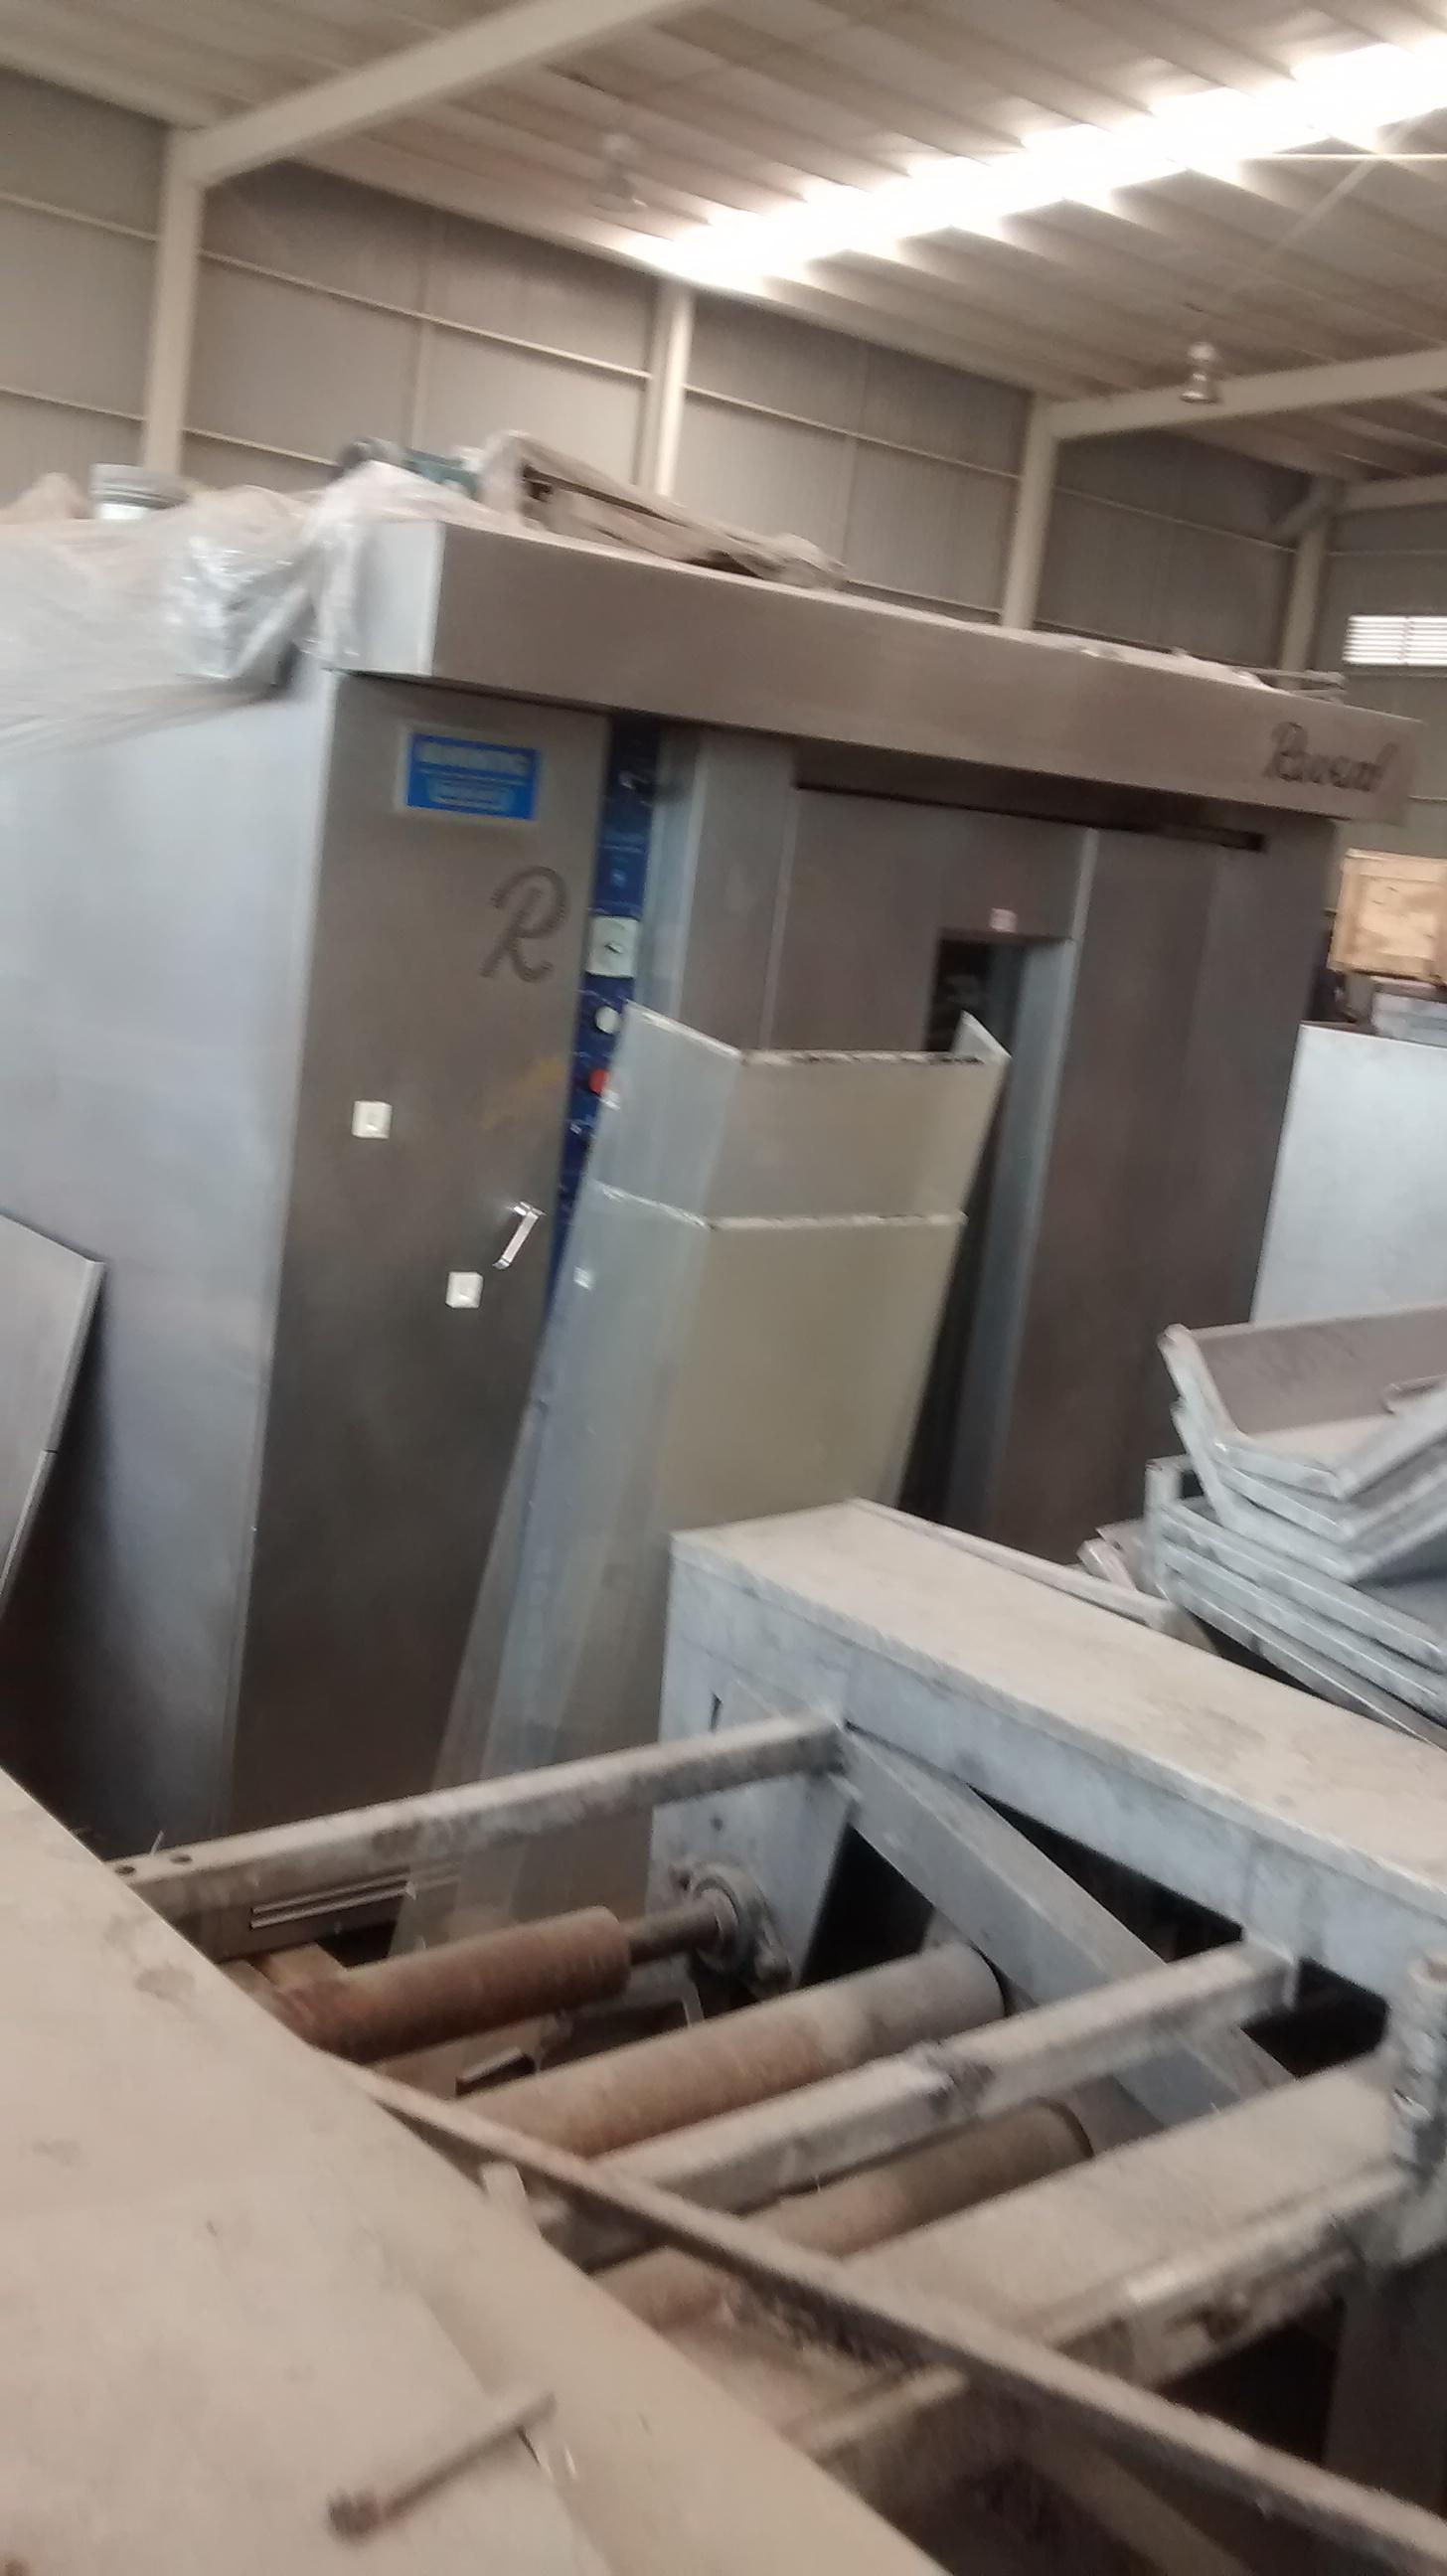 Lot 12 - Revent Oven